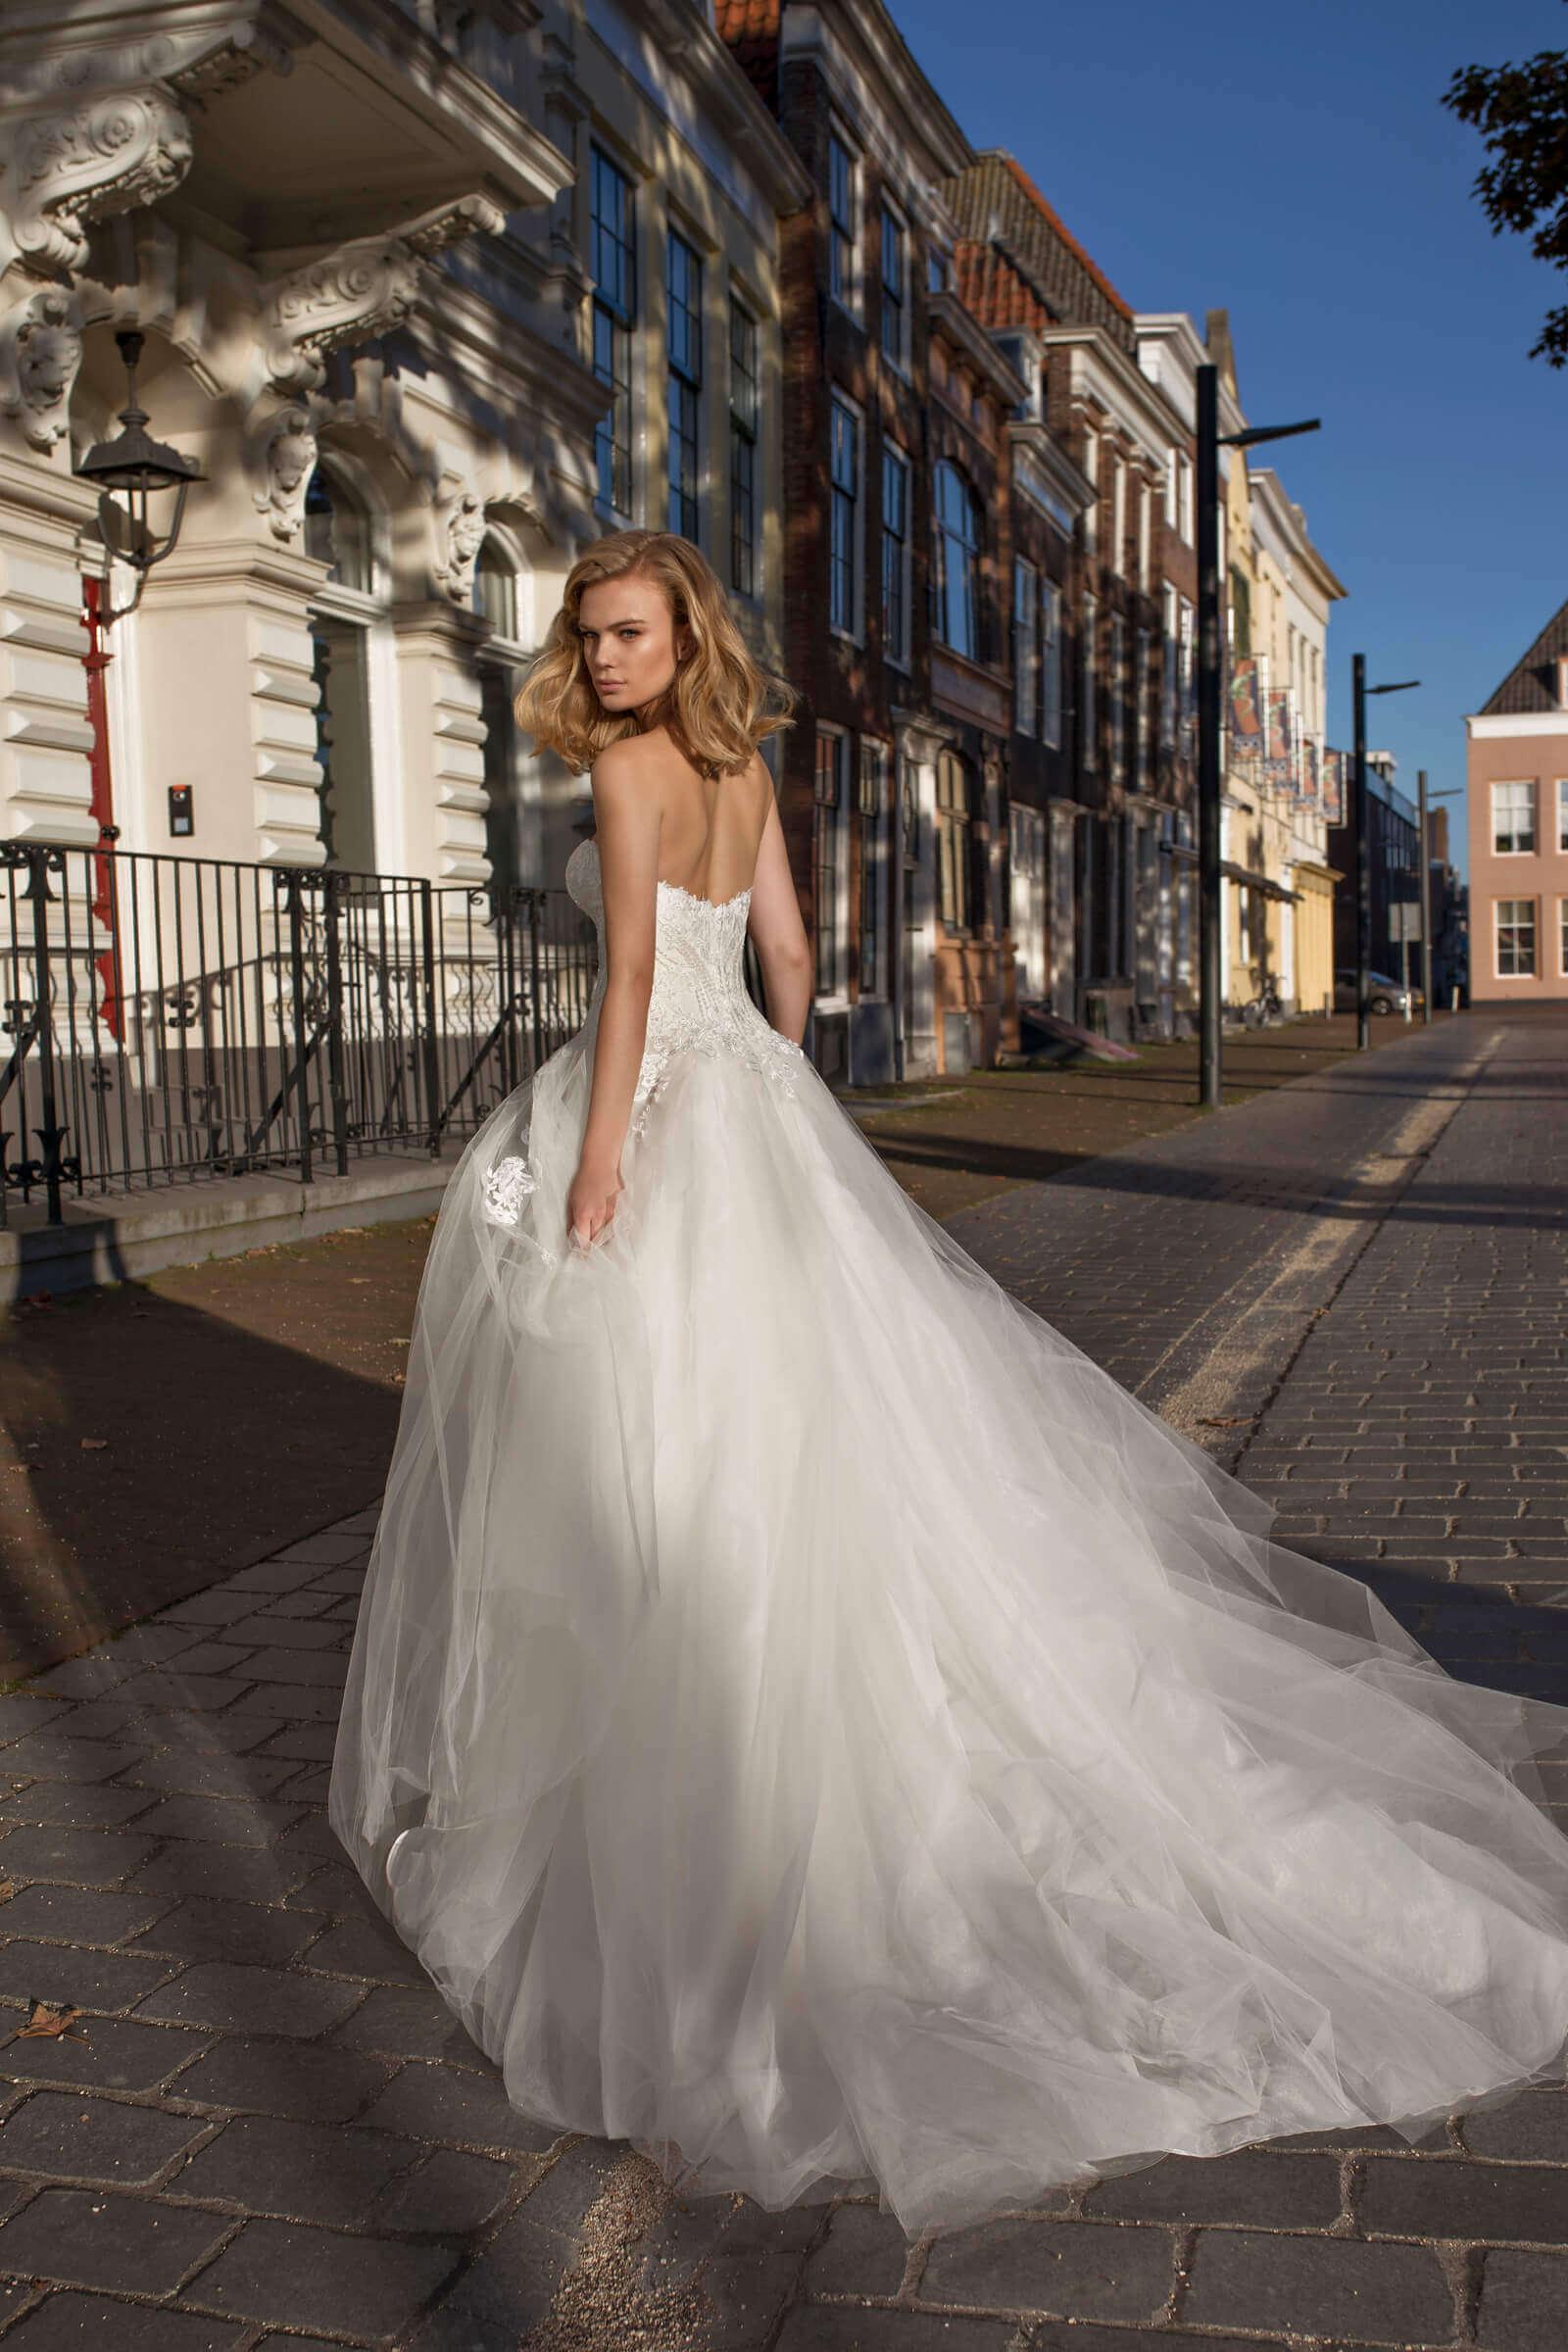 Blush Ely Cambridge Wedding Dress Gallery